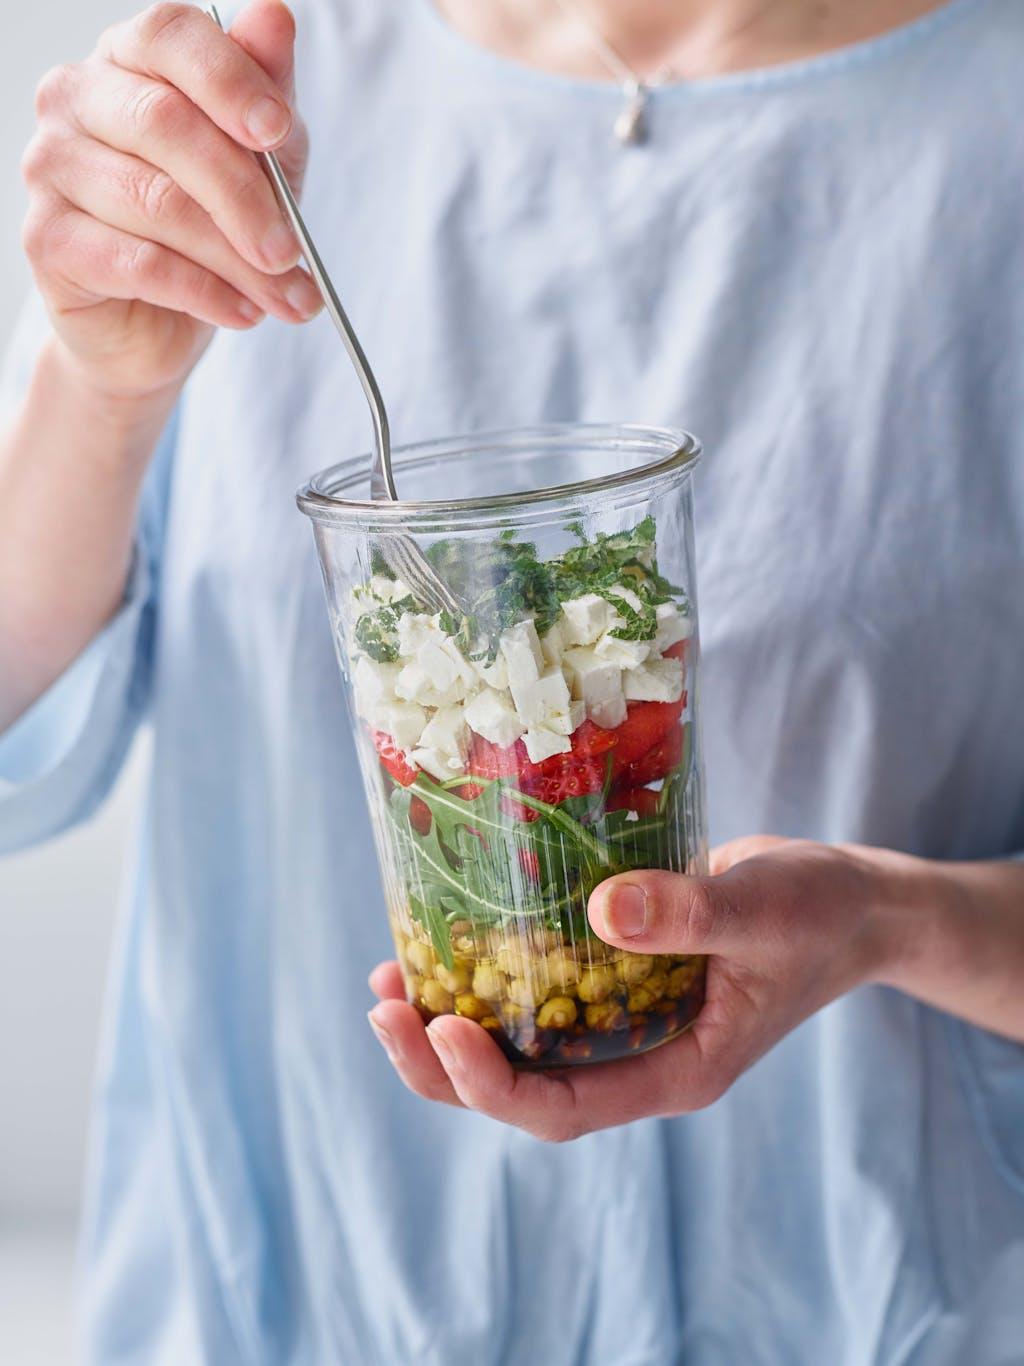 Strawberry kilner jar salad interaction 2 WEB